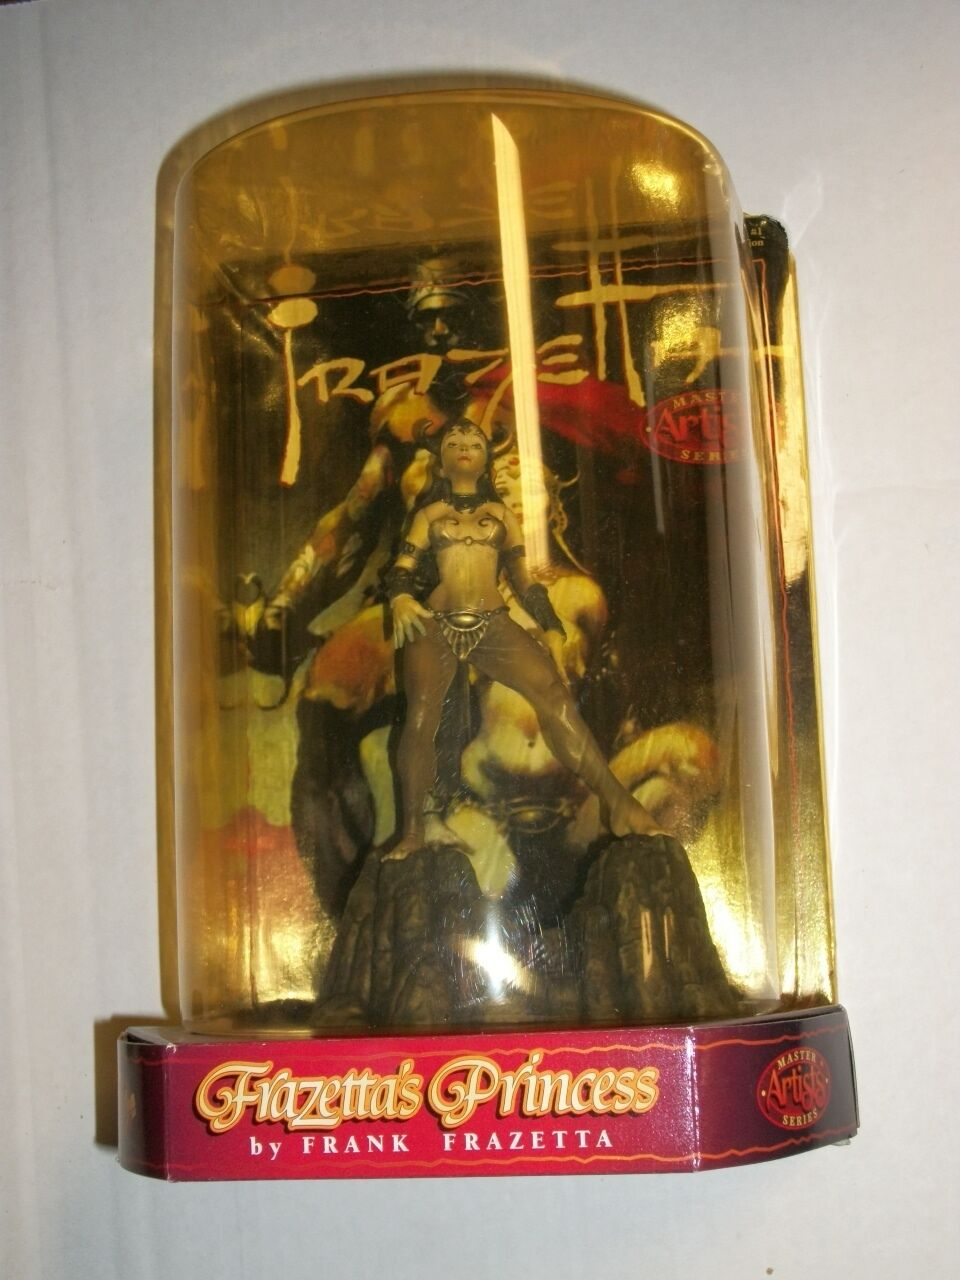 Rare Previews Exclusive Frank FRAZETTA'S PRINCESS Master Artist Figure